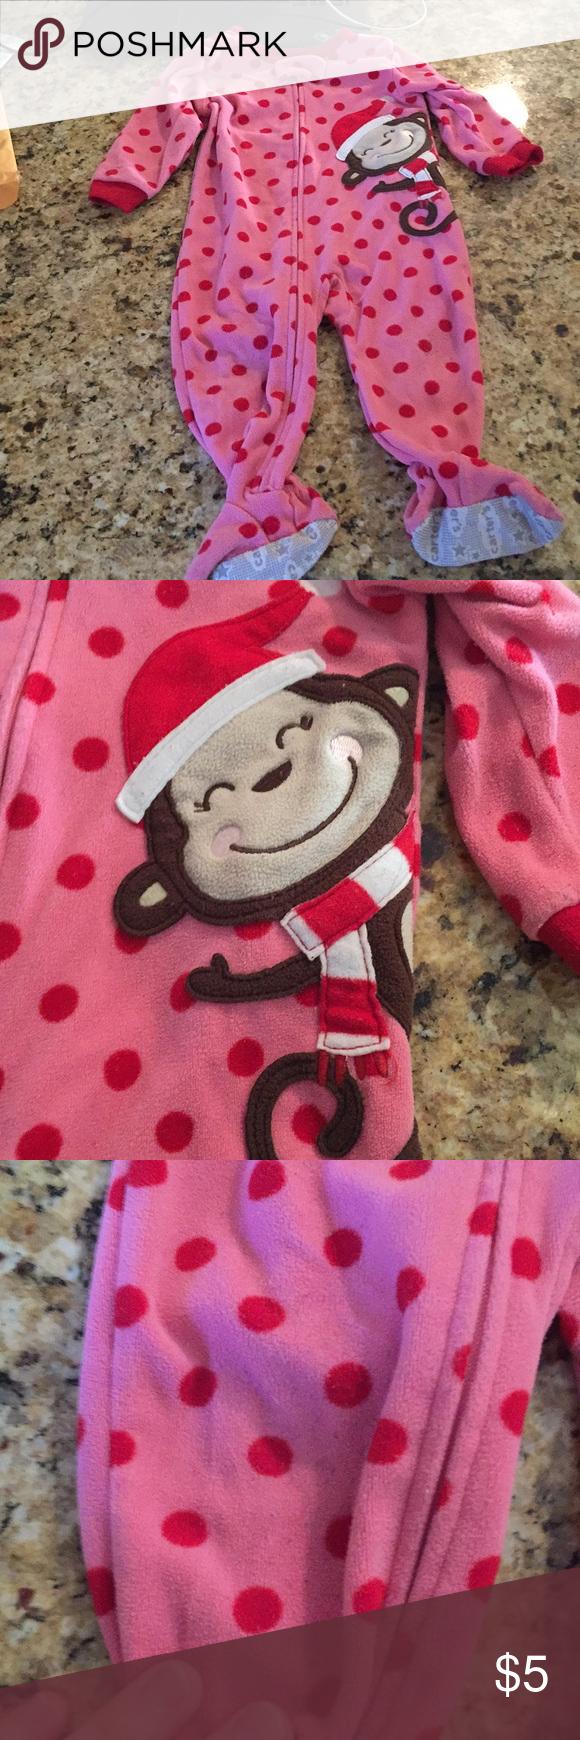 dc7175ac91e4 🎅🏻Carters Christmas Santa monkey pajamas 12 mo in 2018